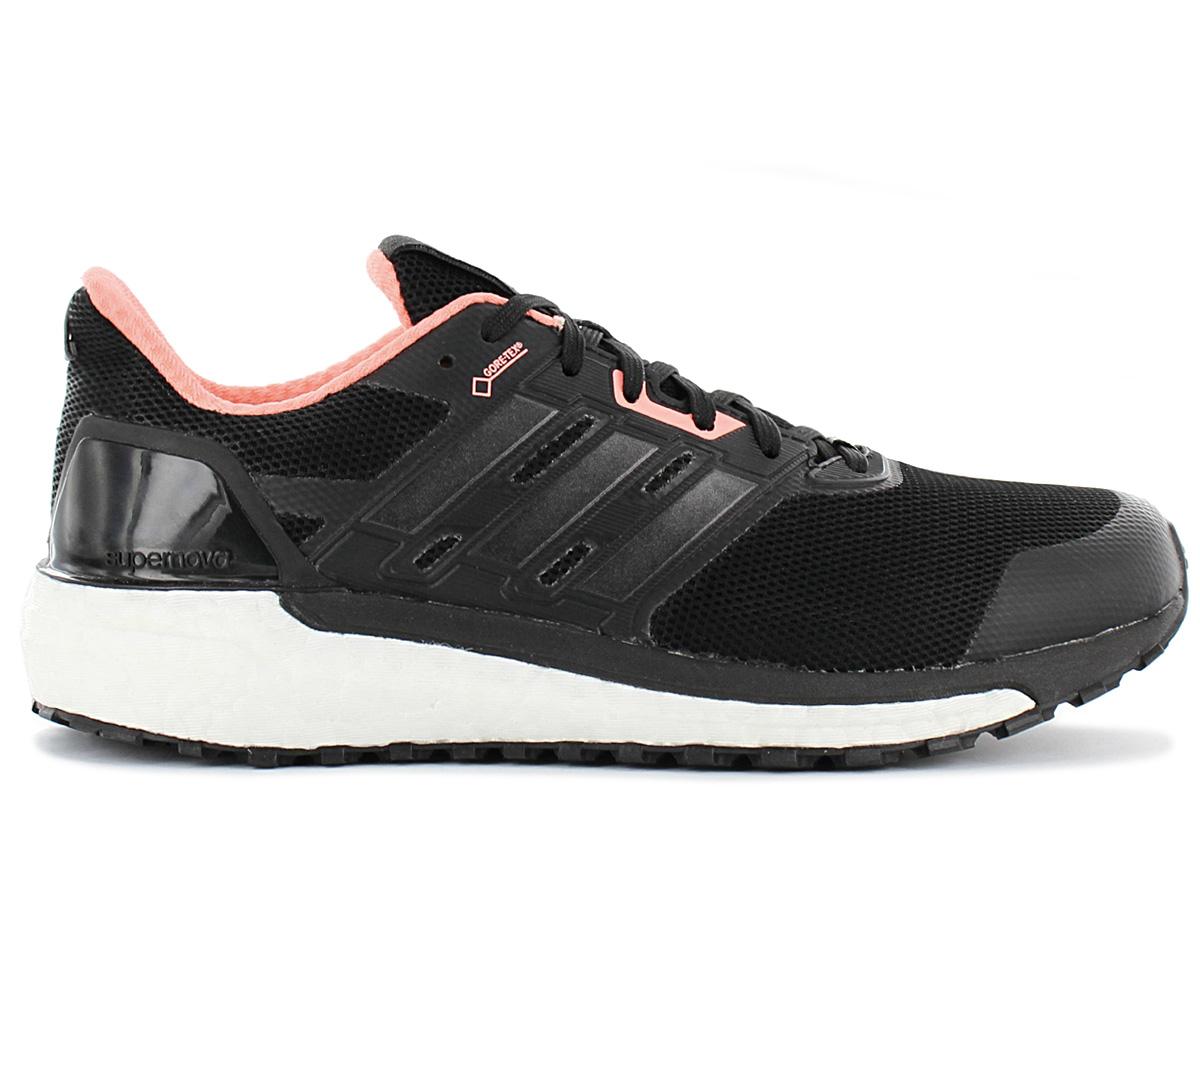 Details about Adidas Supernova Gtx W Gore-tex Women's Running Shoes BB3671  Black Running Shoes